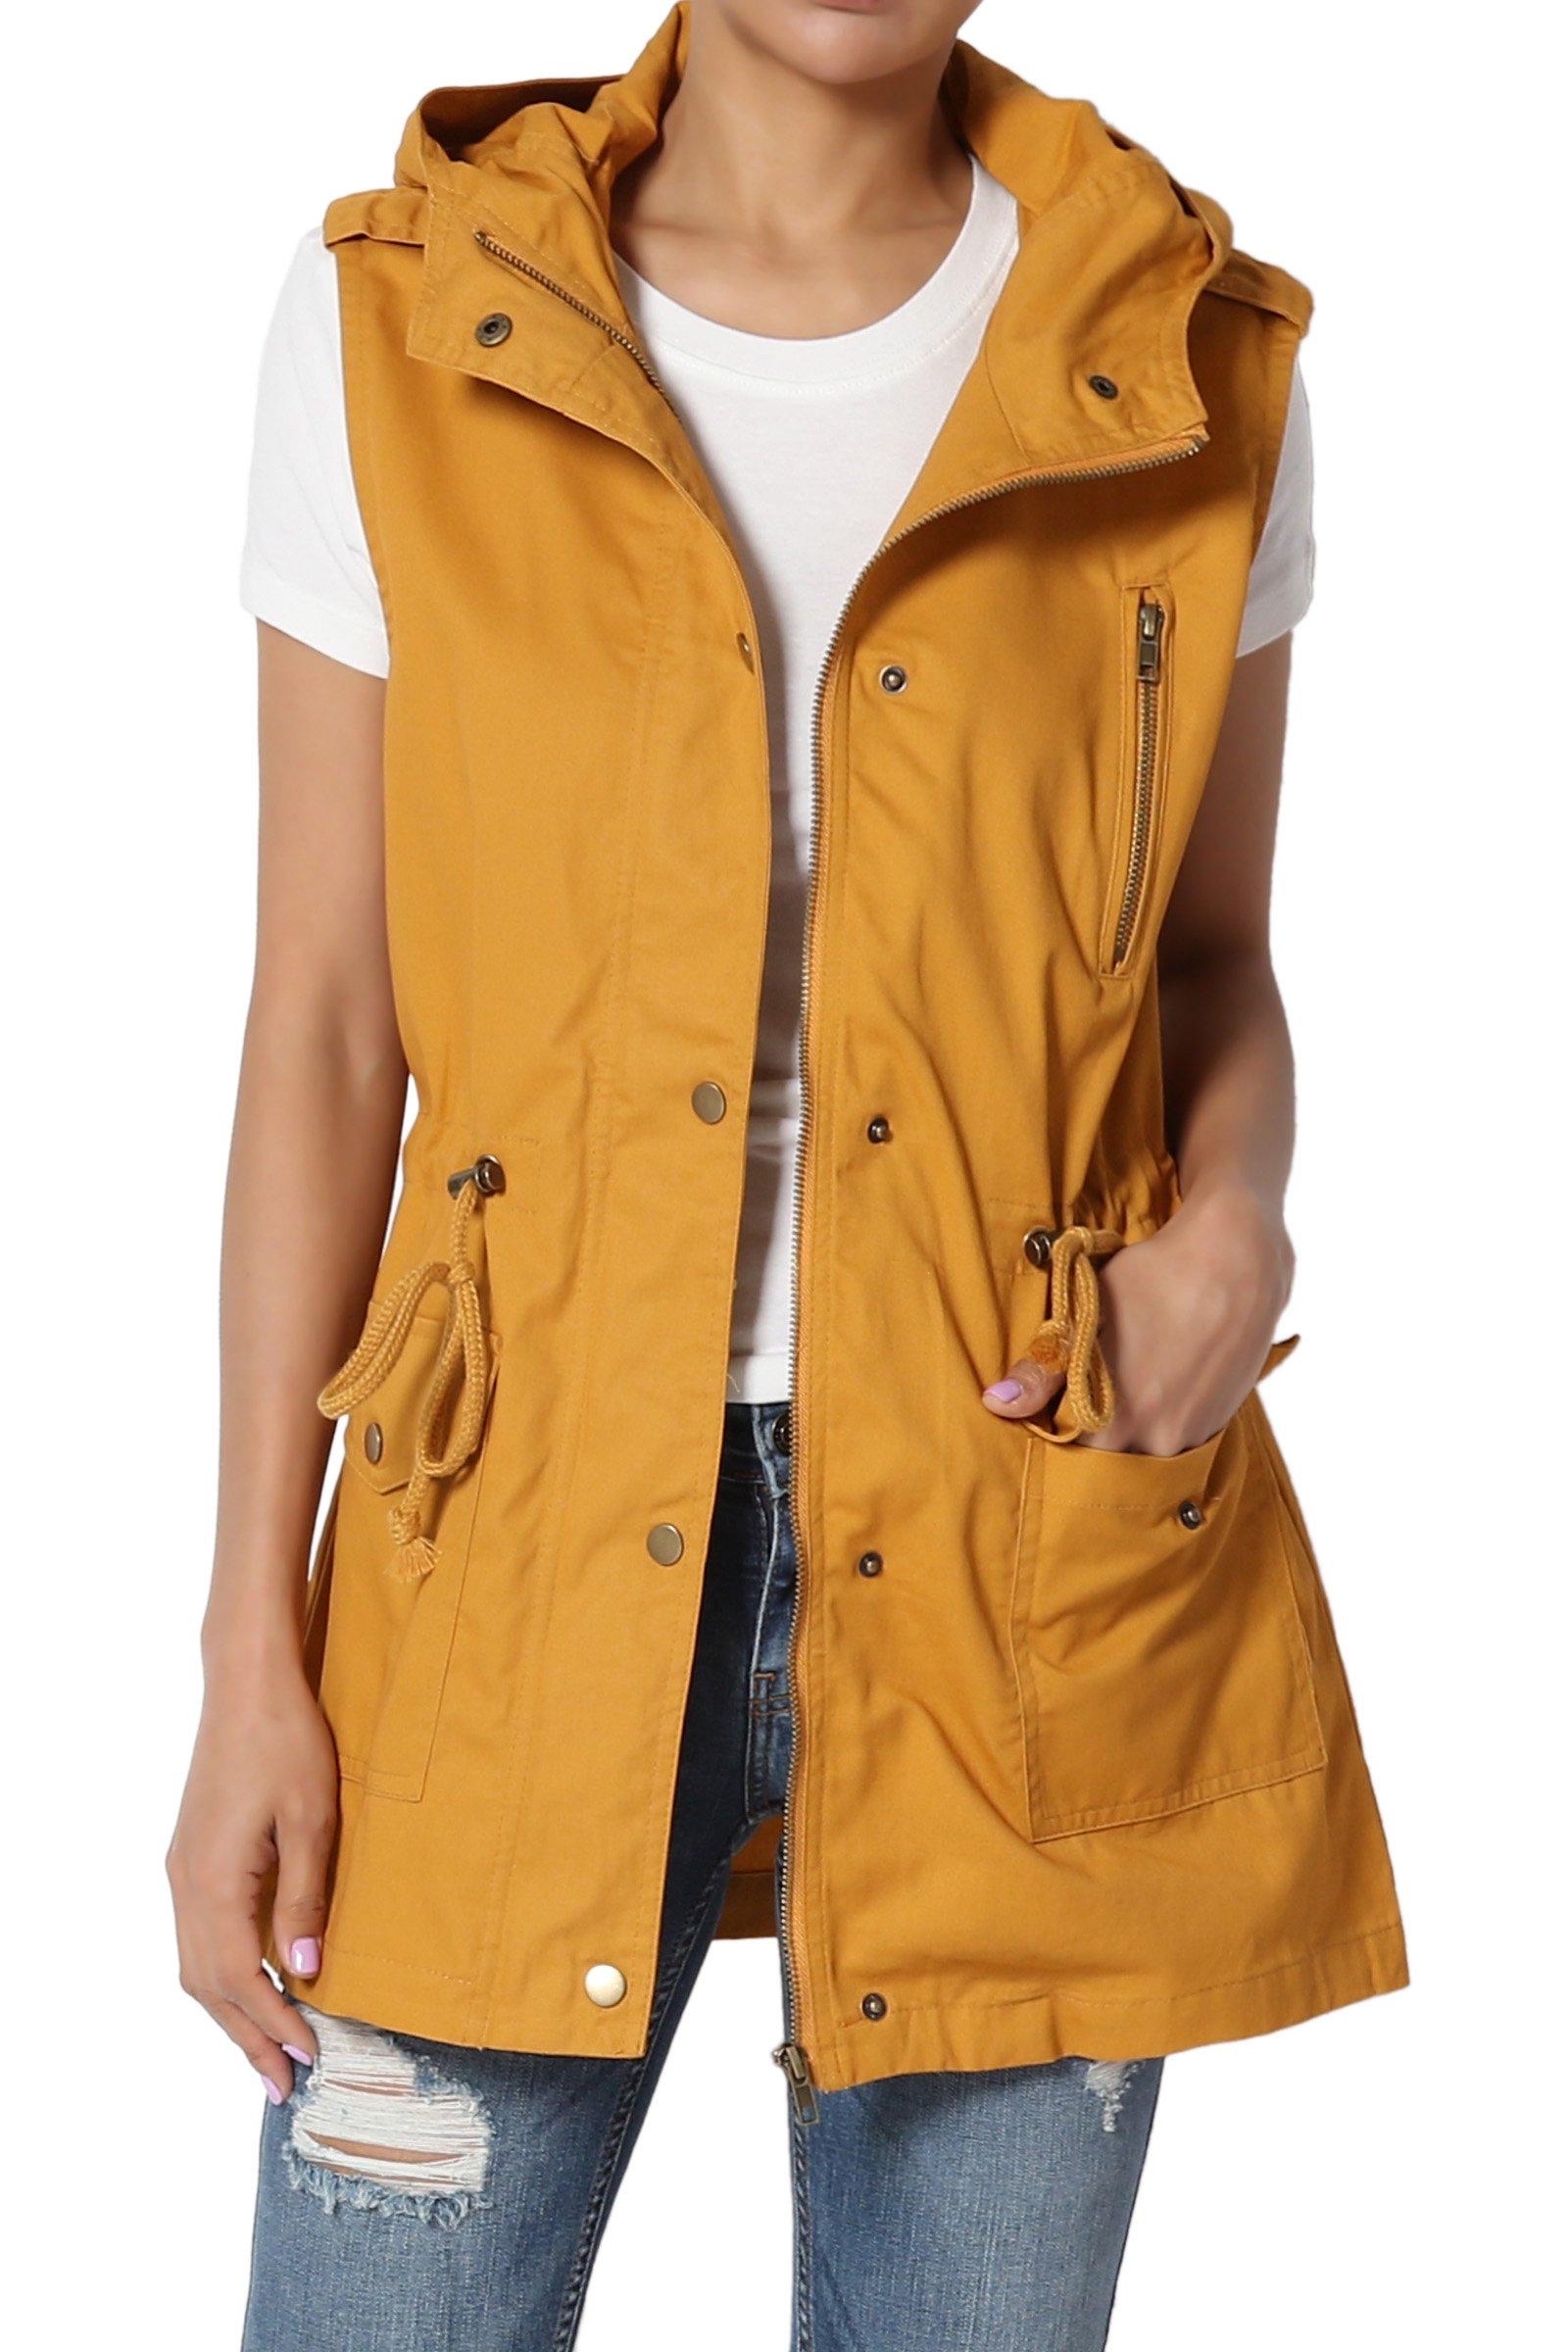 TheMogan Women's Military Drawstring Waist Loose Fit Utility Hoodie Vest Mustard M